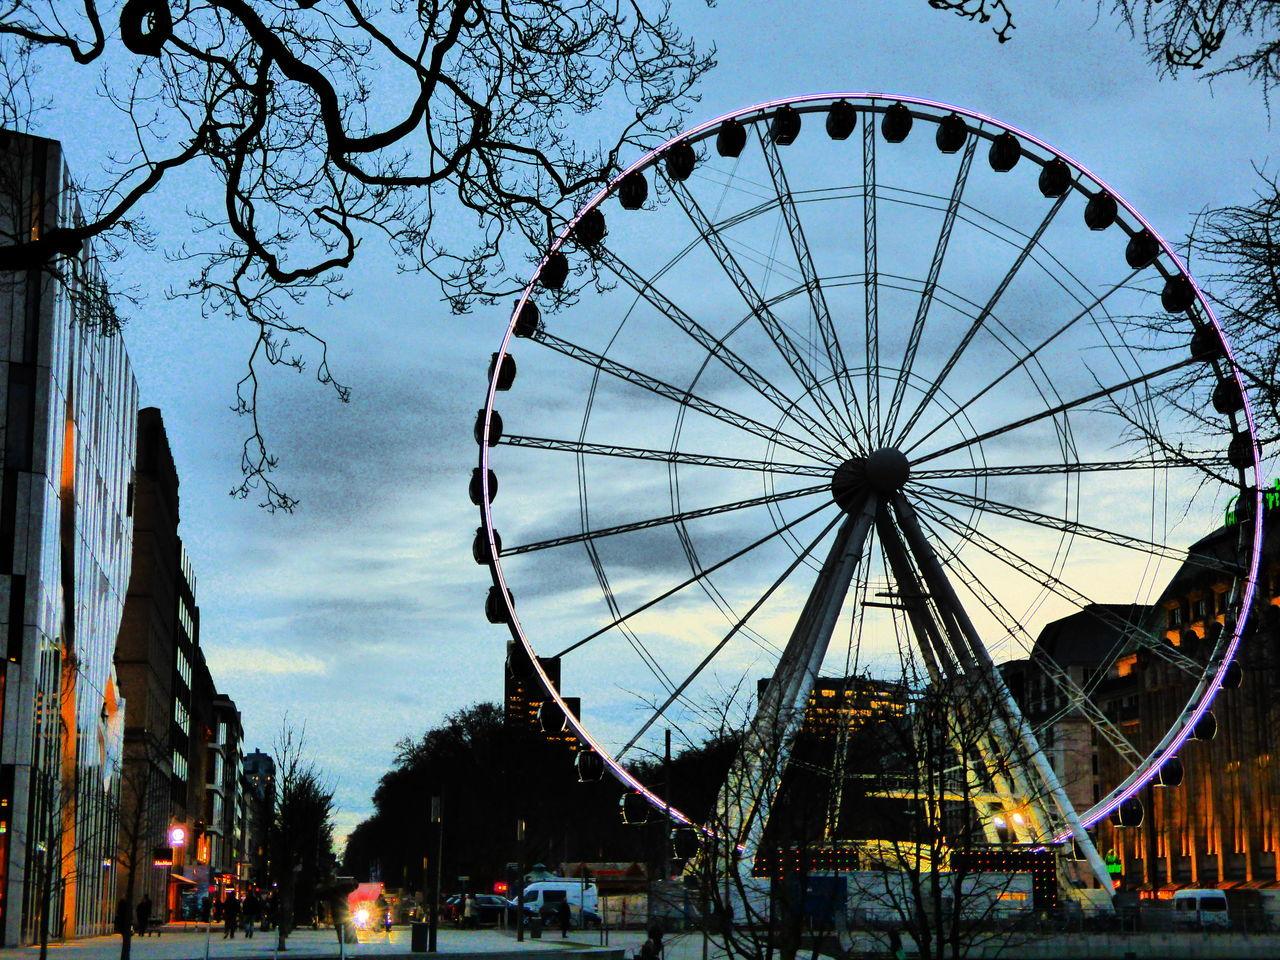 ferris wheel, amusement park, arts culture and entertainment, big wheel, sky, amusement park ride, built structure, tree, outdoors, architecture, building exterior, no people, low angle view, day, clear sky, city